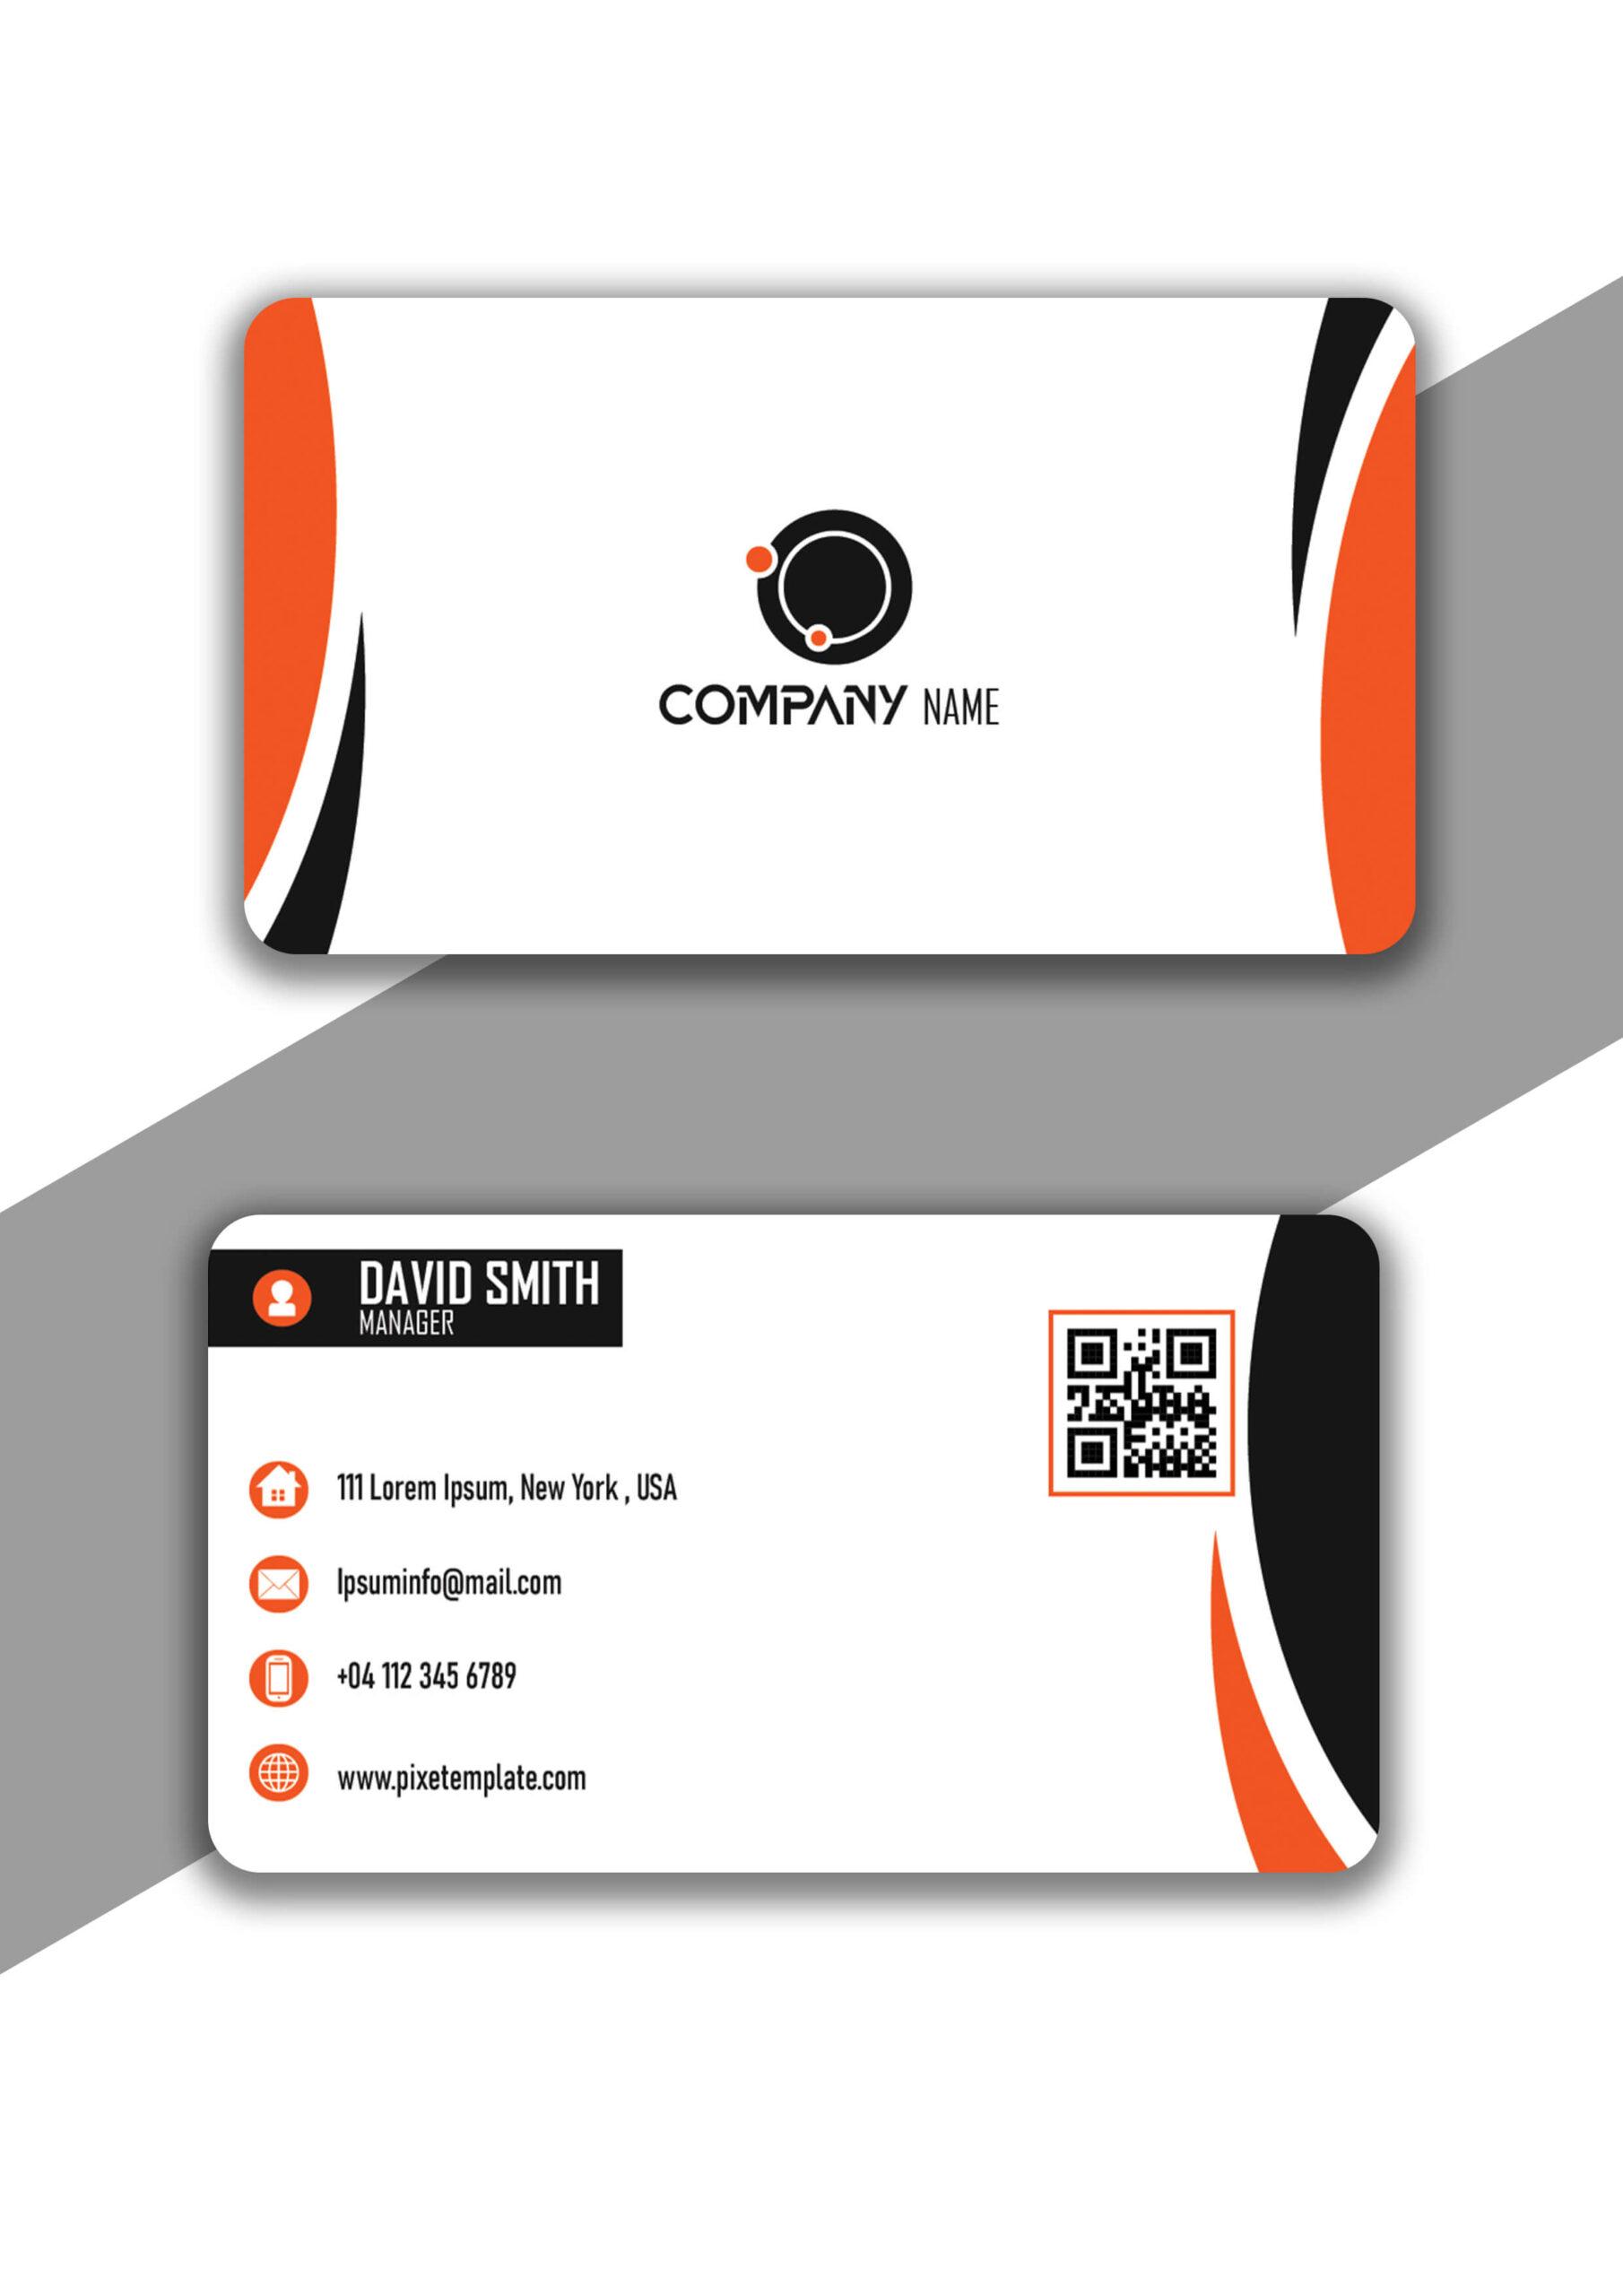 Orange and Black Curvy Business Card Design in Illustrator